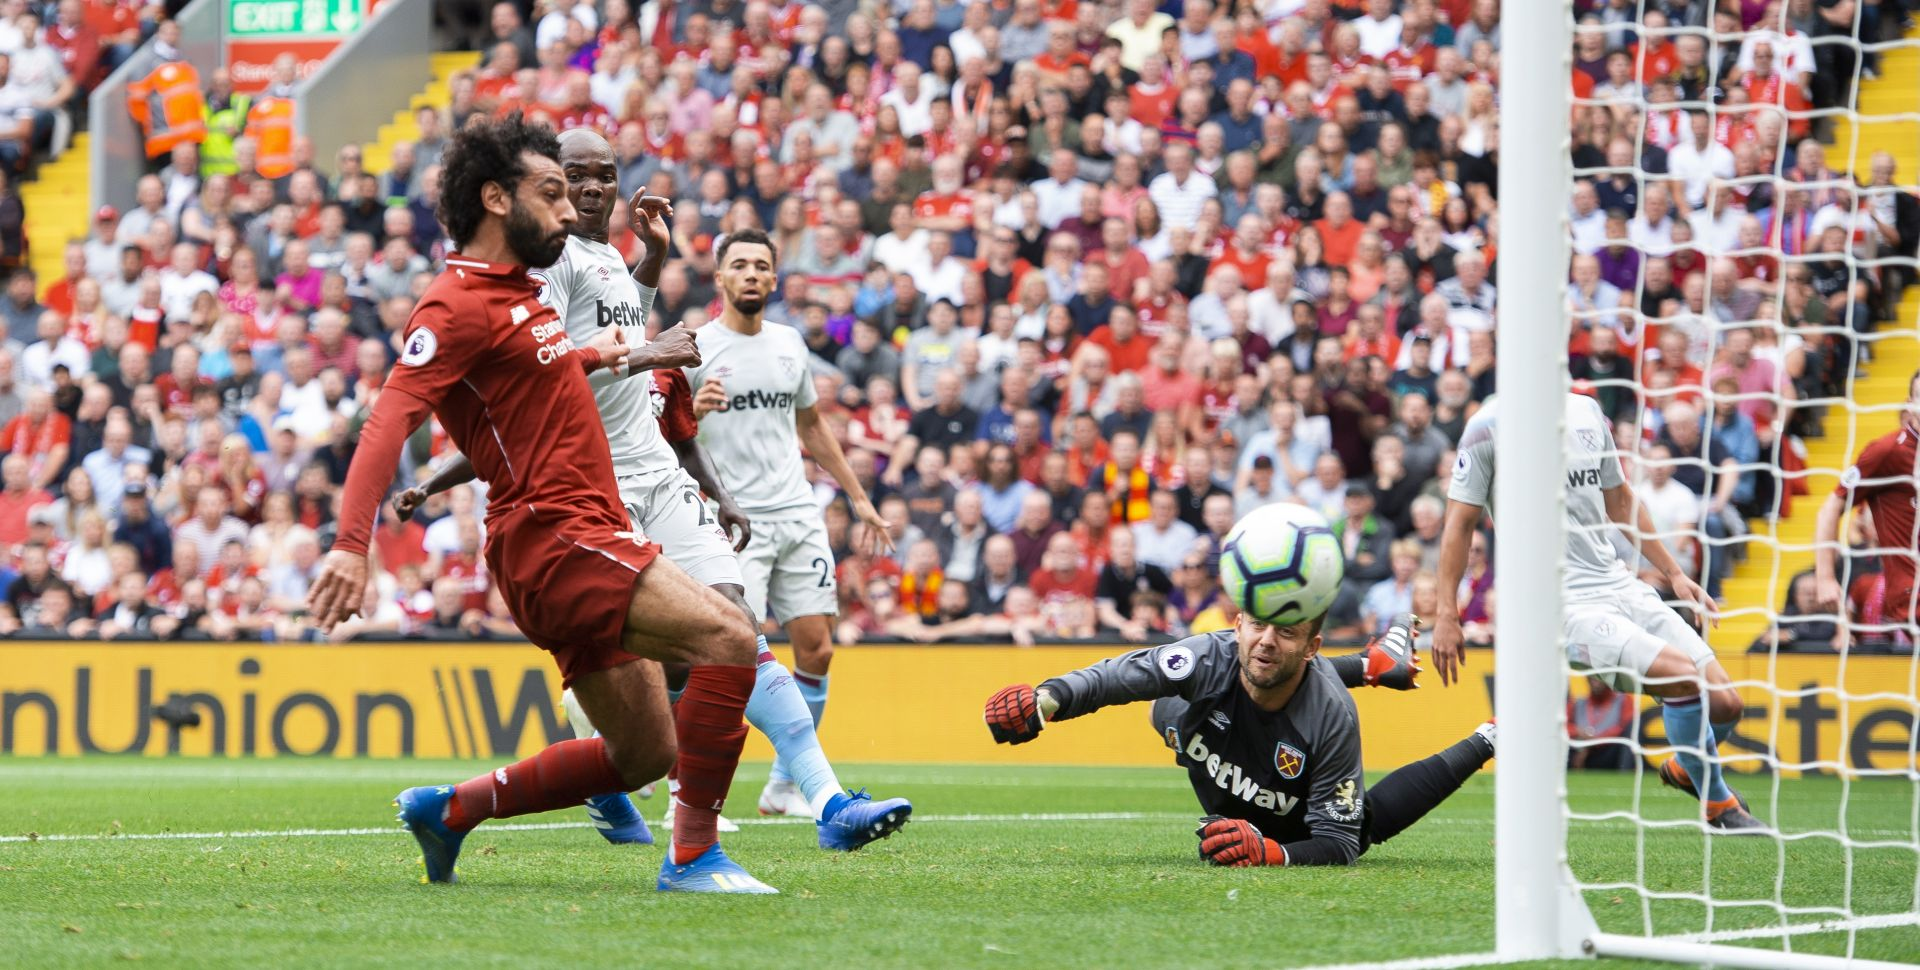 PEMIERLIGA Liverpool zabio četiri gola West Hamu